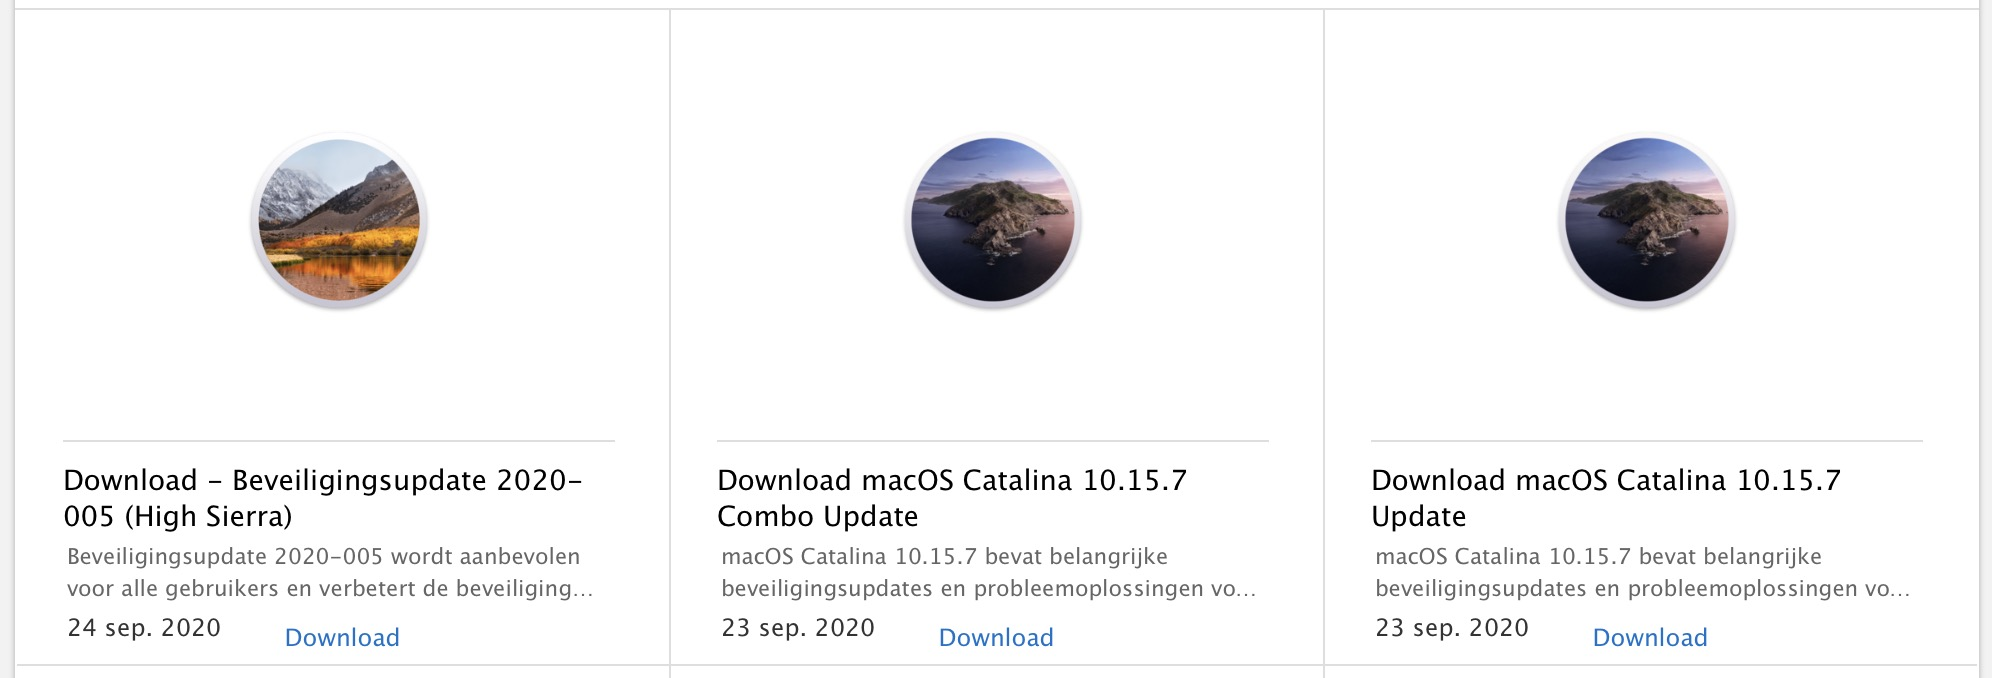 https://www.macfreak.nl/modules/news/images/zArt.AppleDownloadsMacOS.jpg